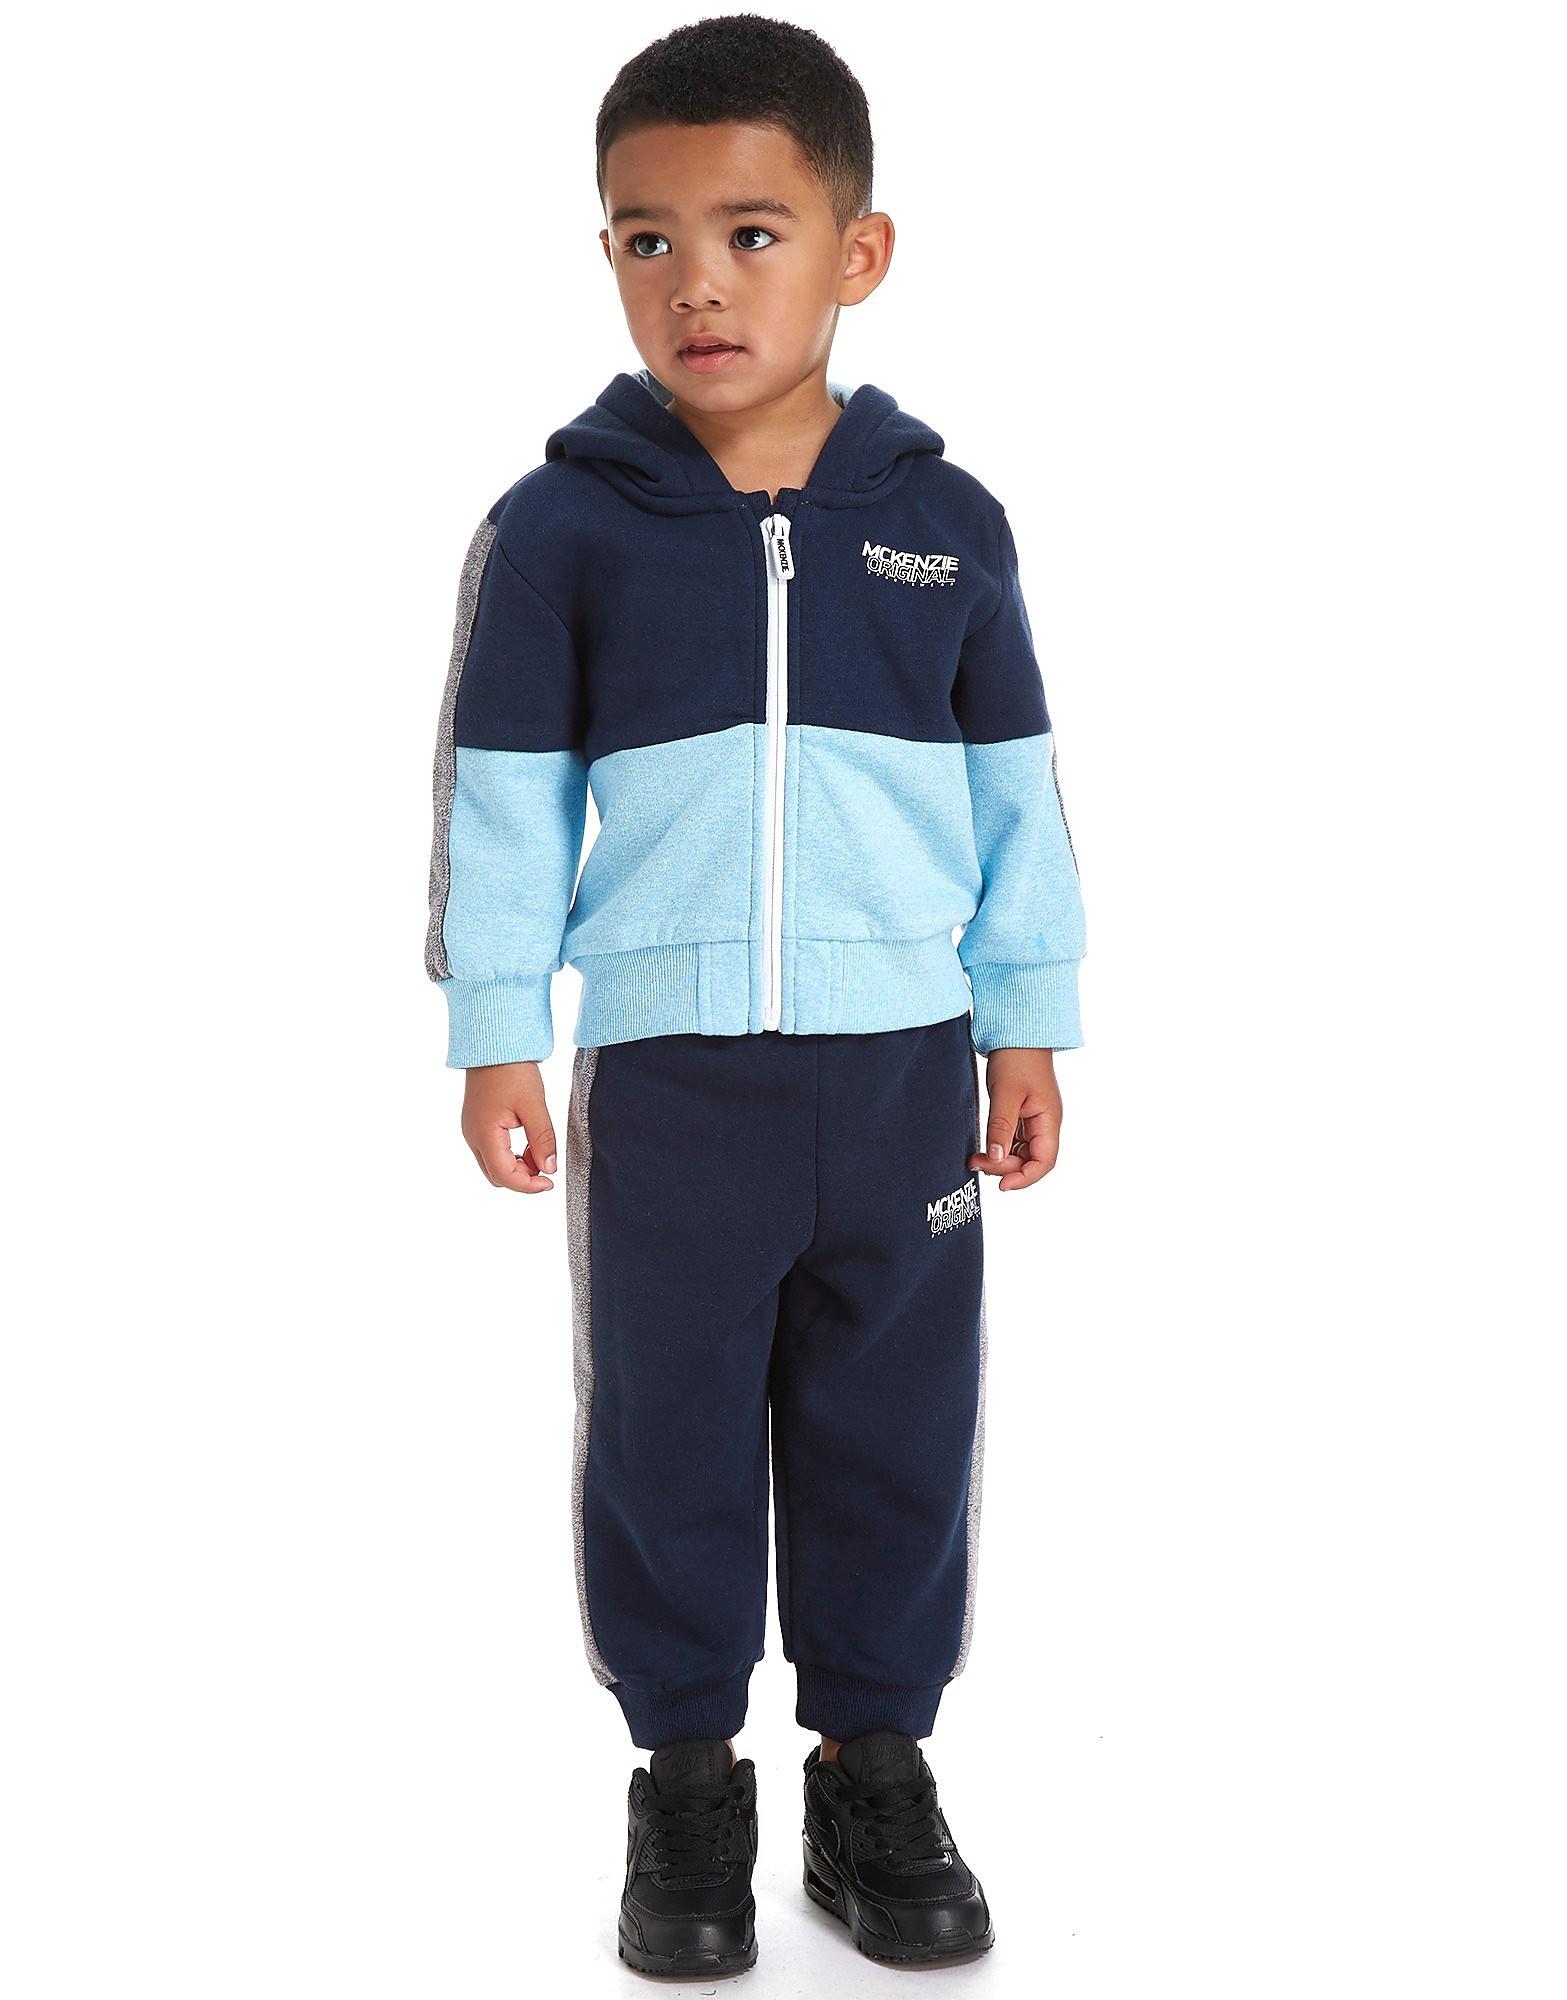 McKenzie Eddie Suit Infants